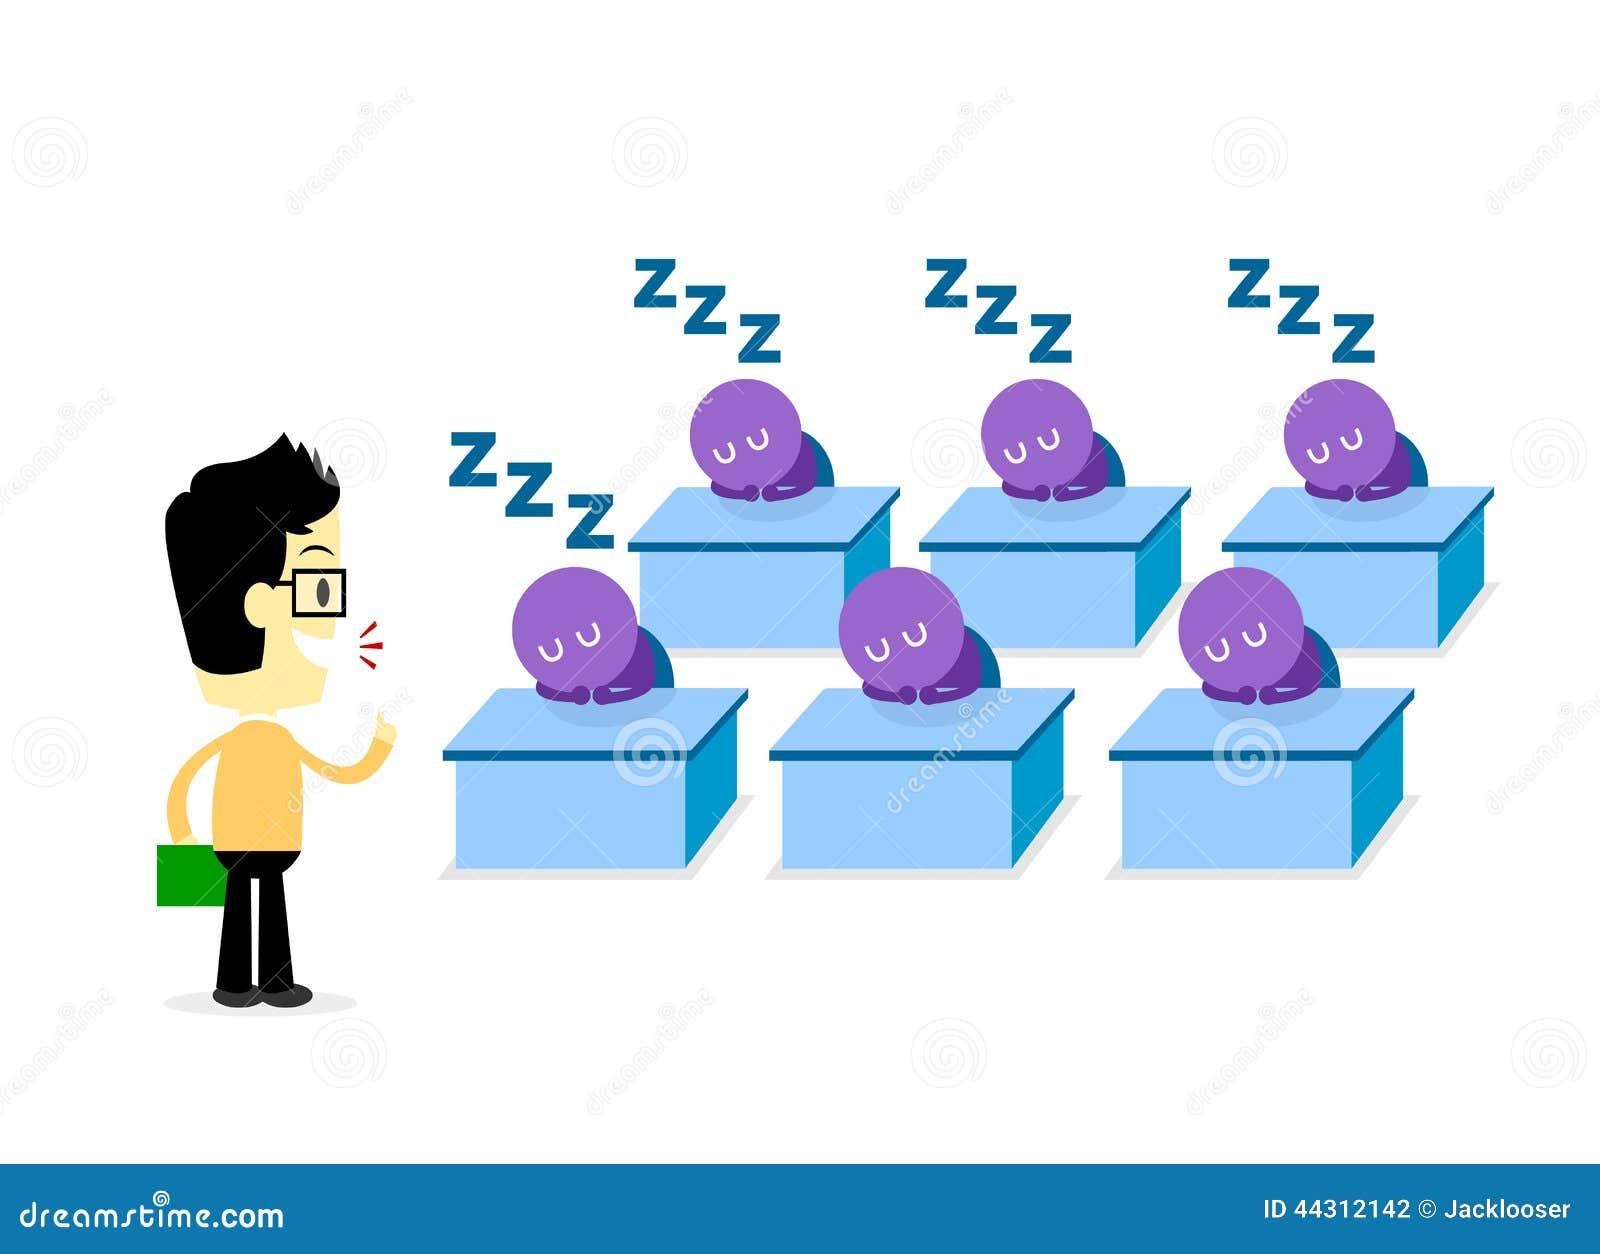 boring lecturer stock vector illustration of speech